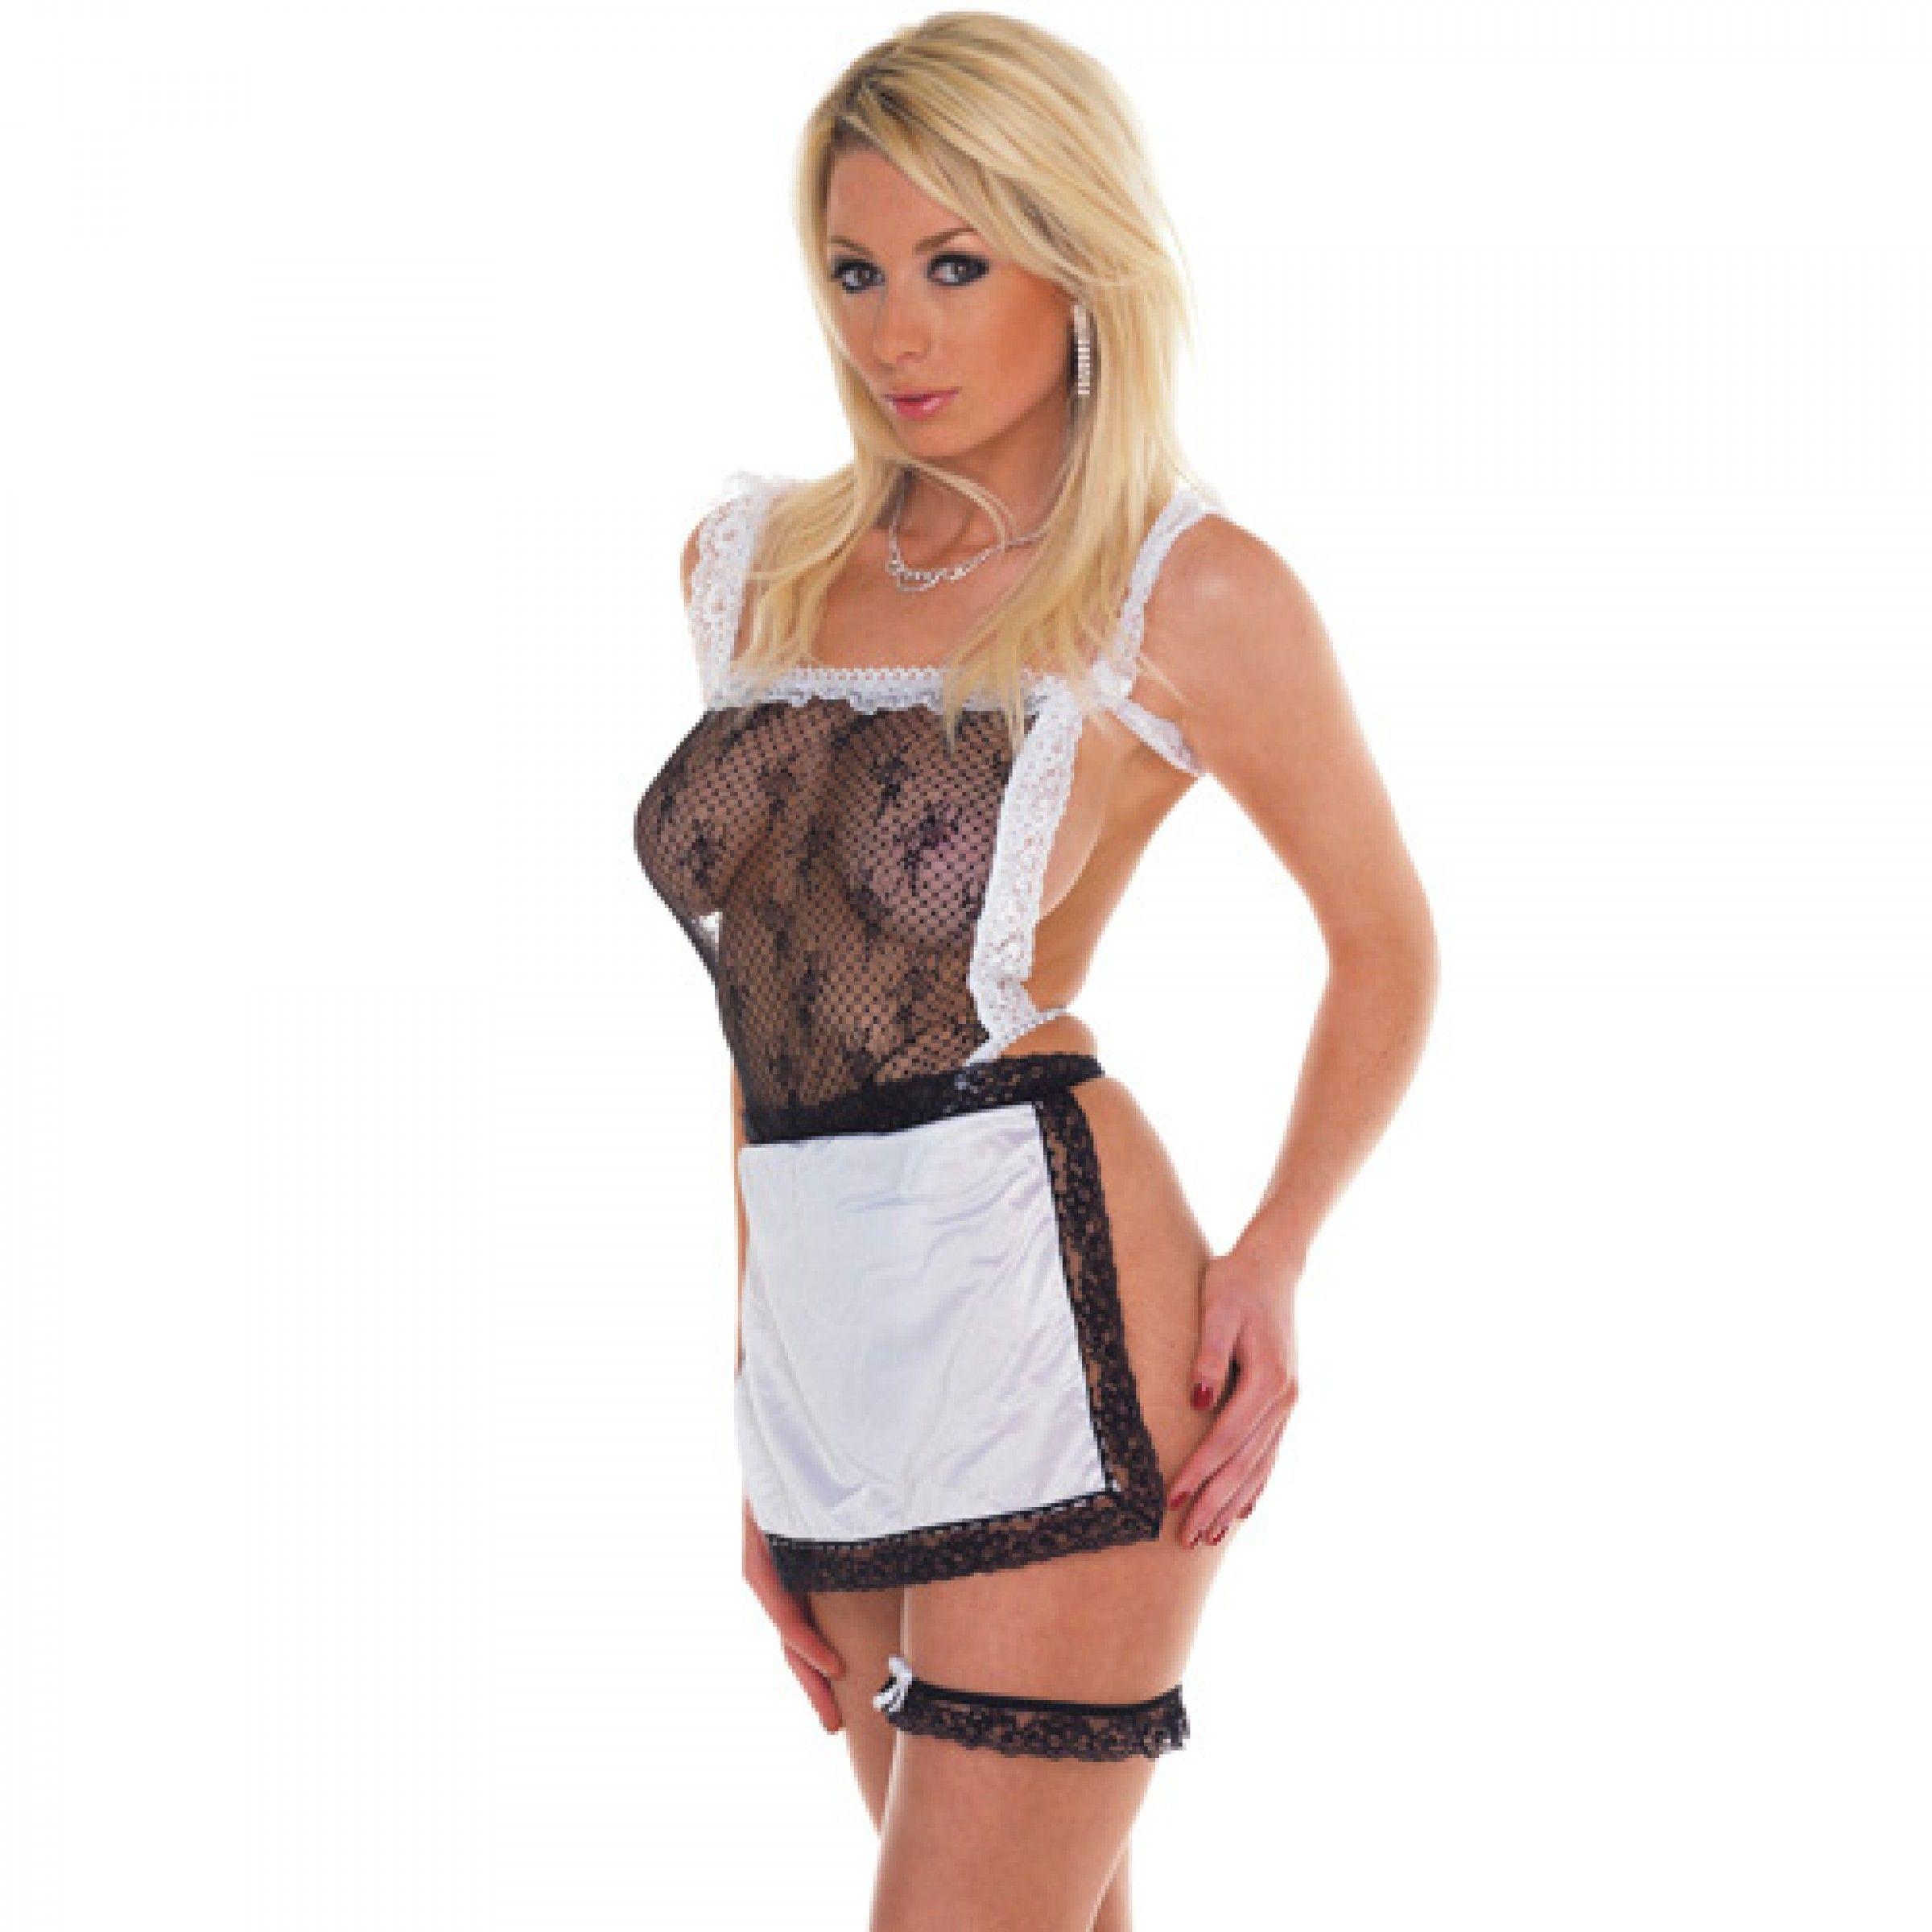 Sexy Maids Set #frenchmaid #sexymaid #halloweencostumes #sexycostumes